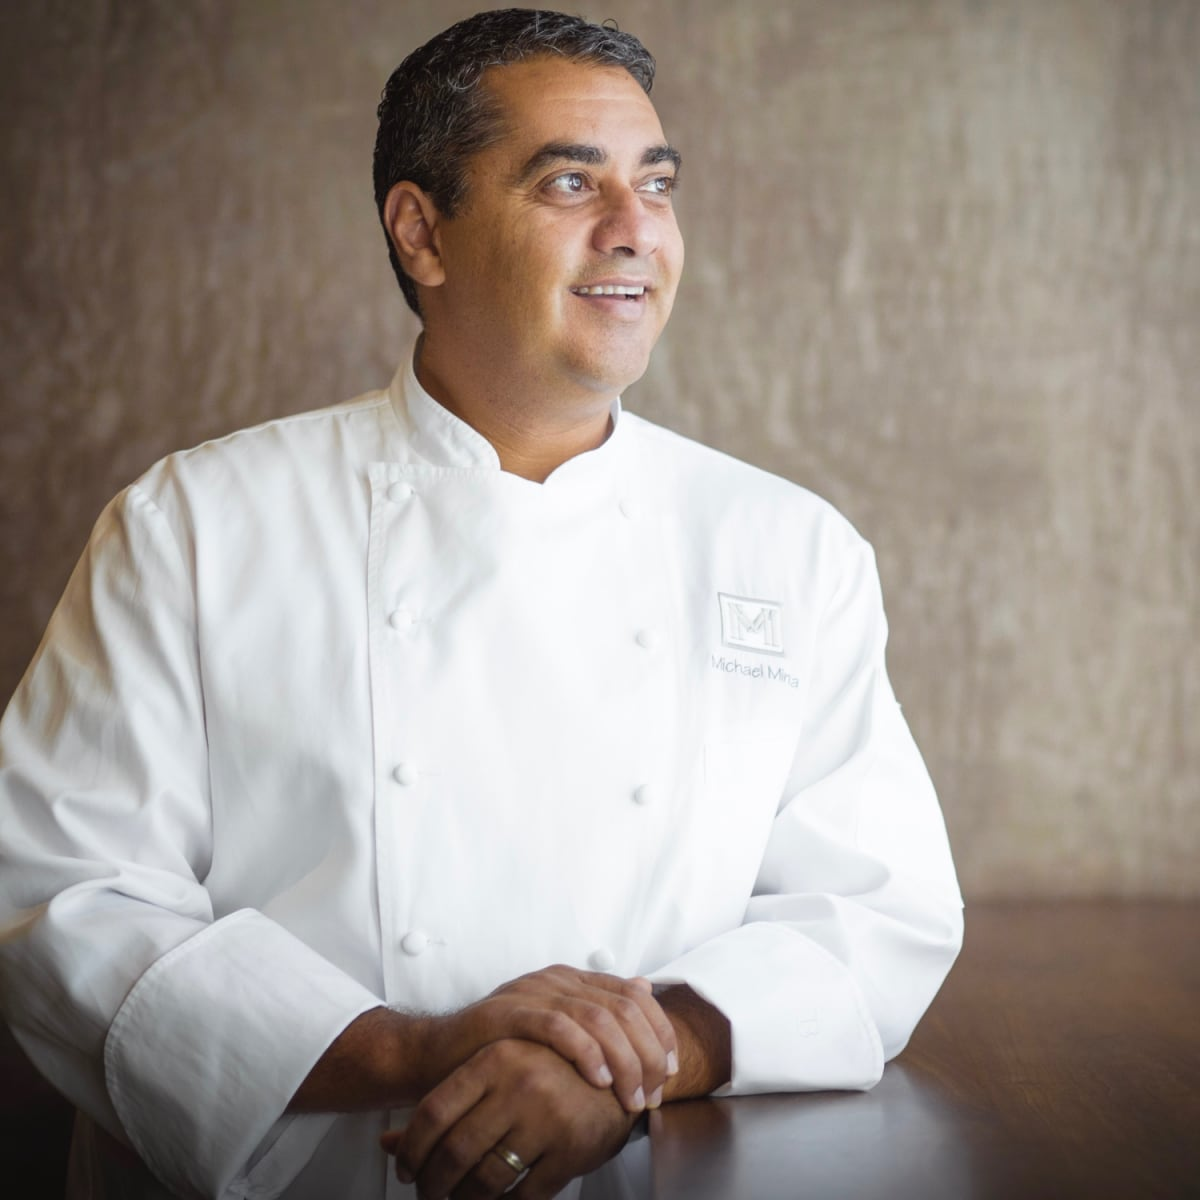 Michael Mina chef